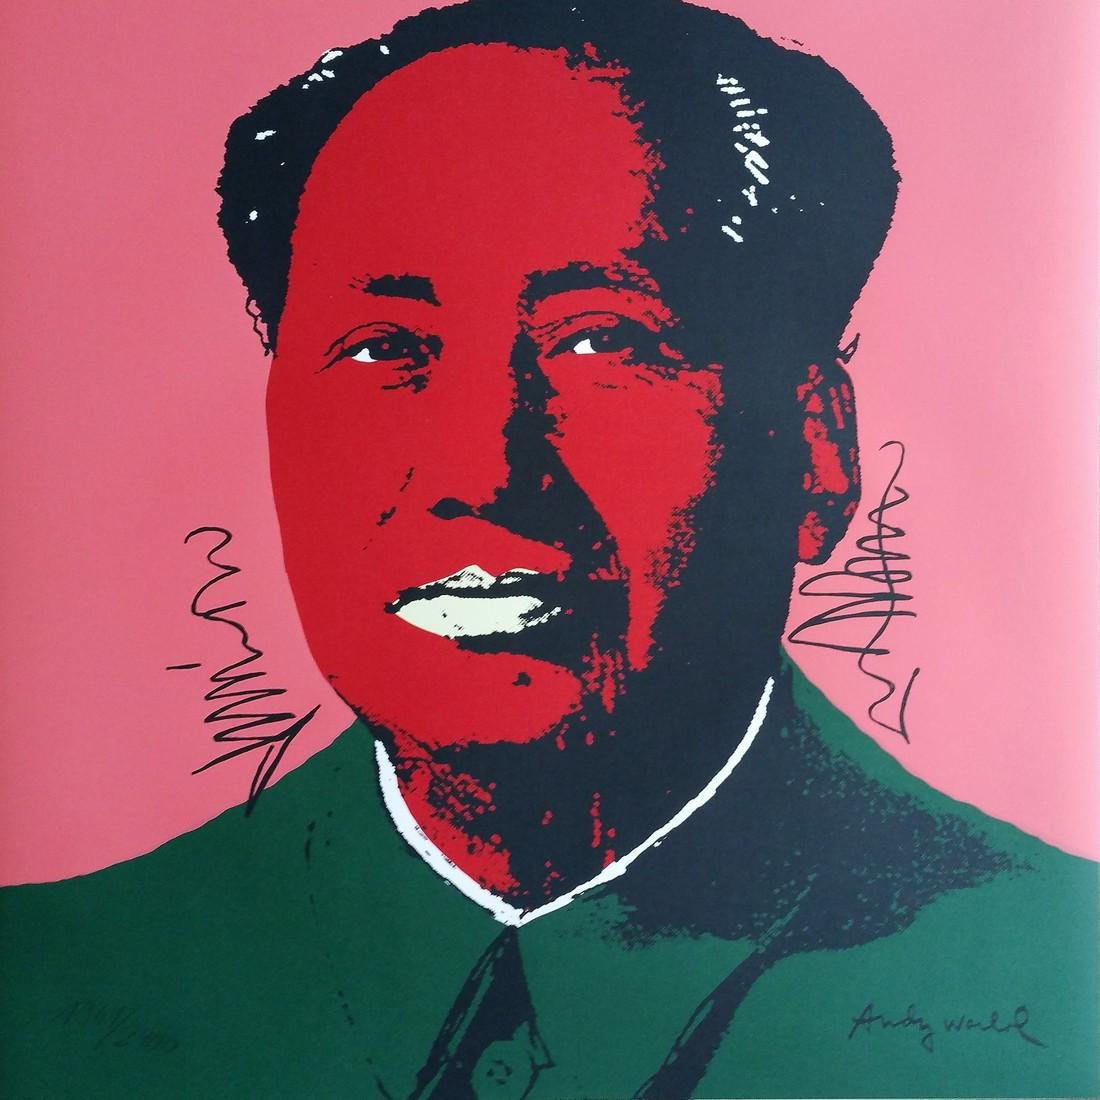 Mao (1967), Granolithograph - Andy Warhol